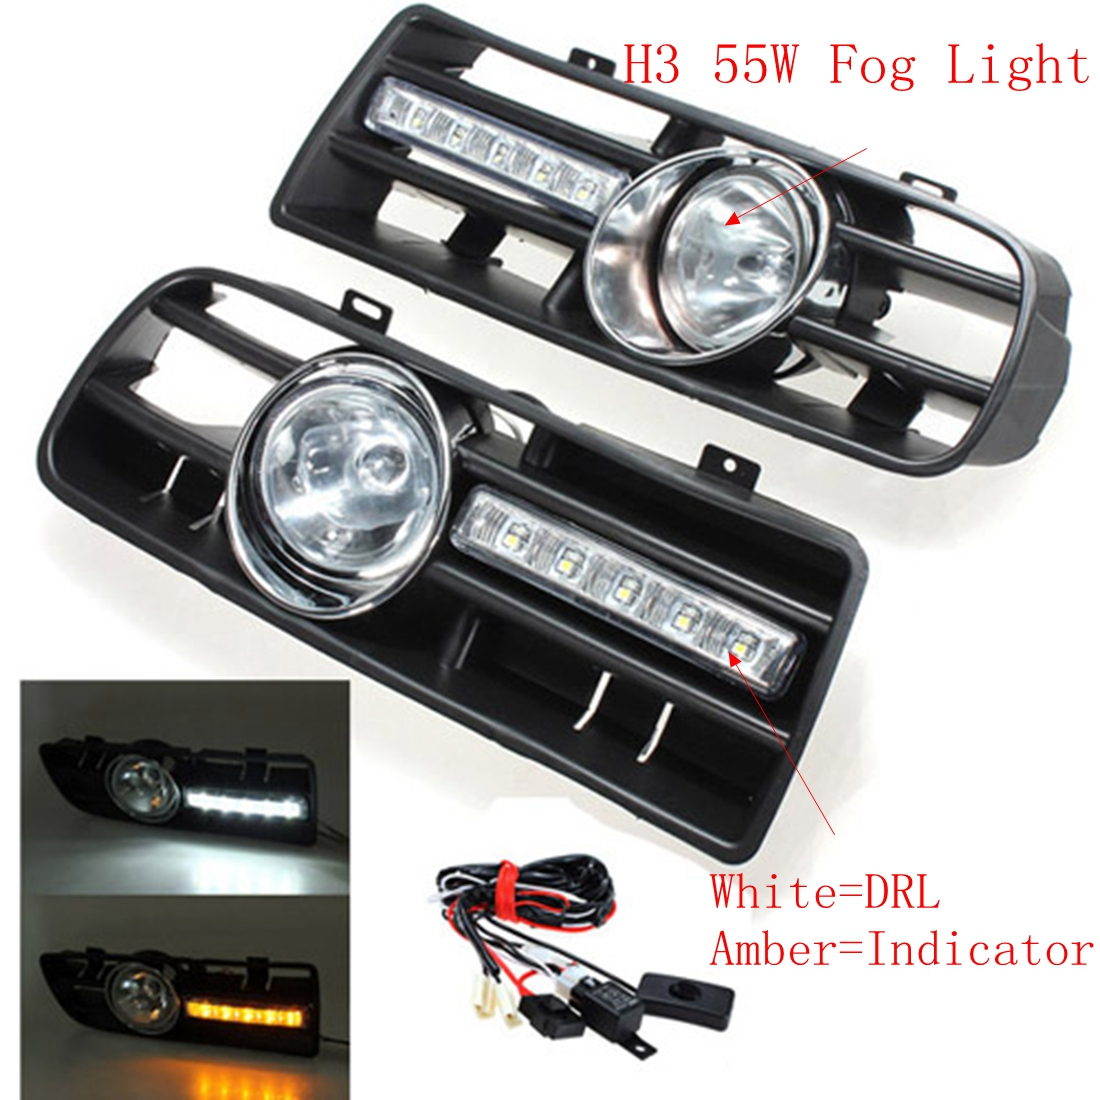 2Pcs for VW GOLF MK4 1997-2006 Car Front Bumper Grille Driving Fog Lamp Light Set With LED